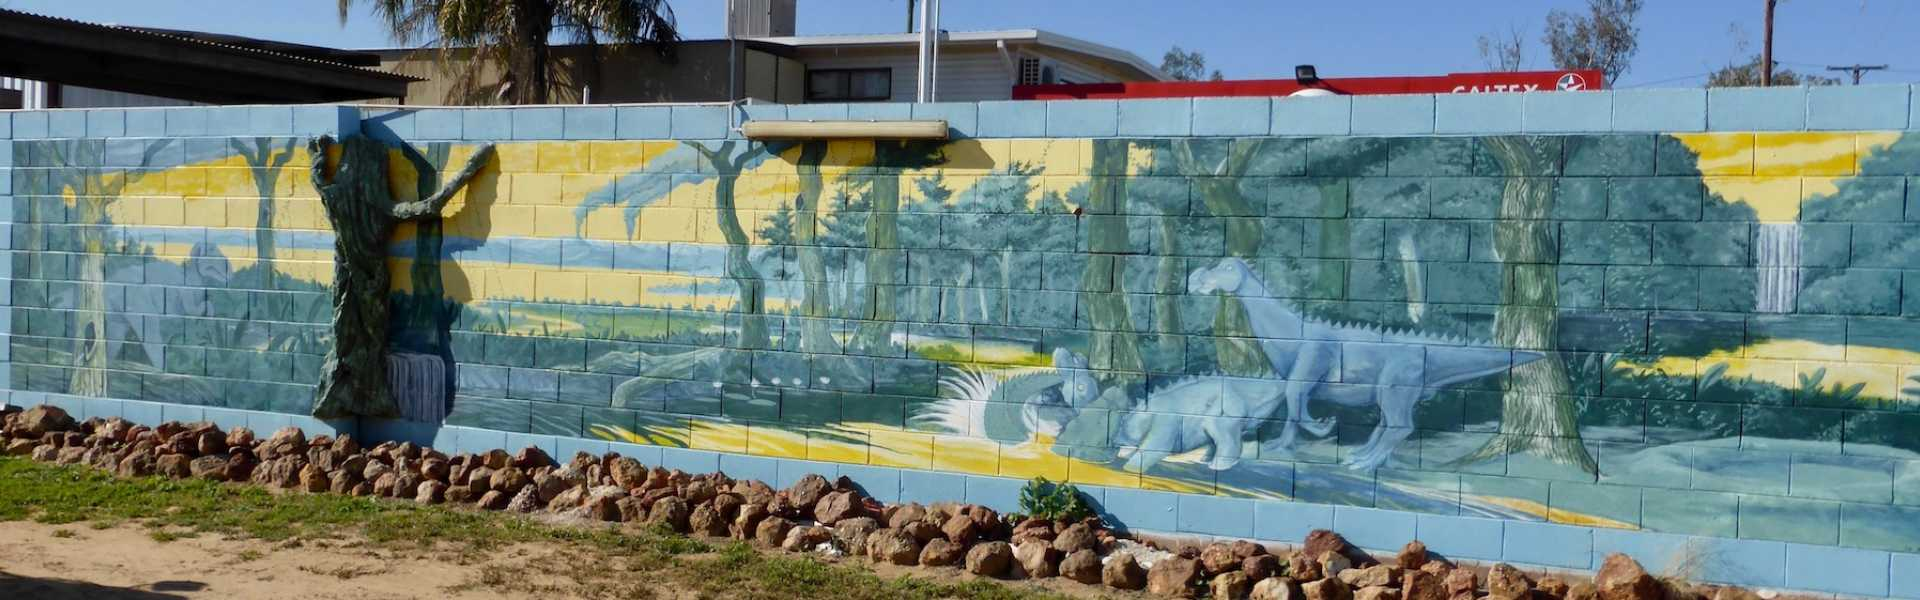 Kui Parks, Crocodile Caravan Park, Lightning Ridge, Wall Mural